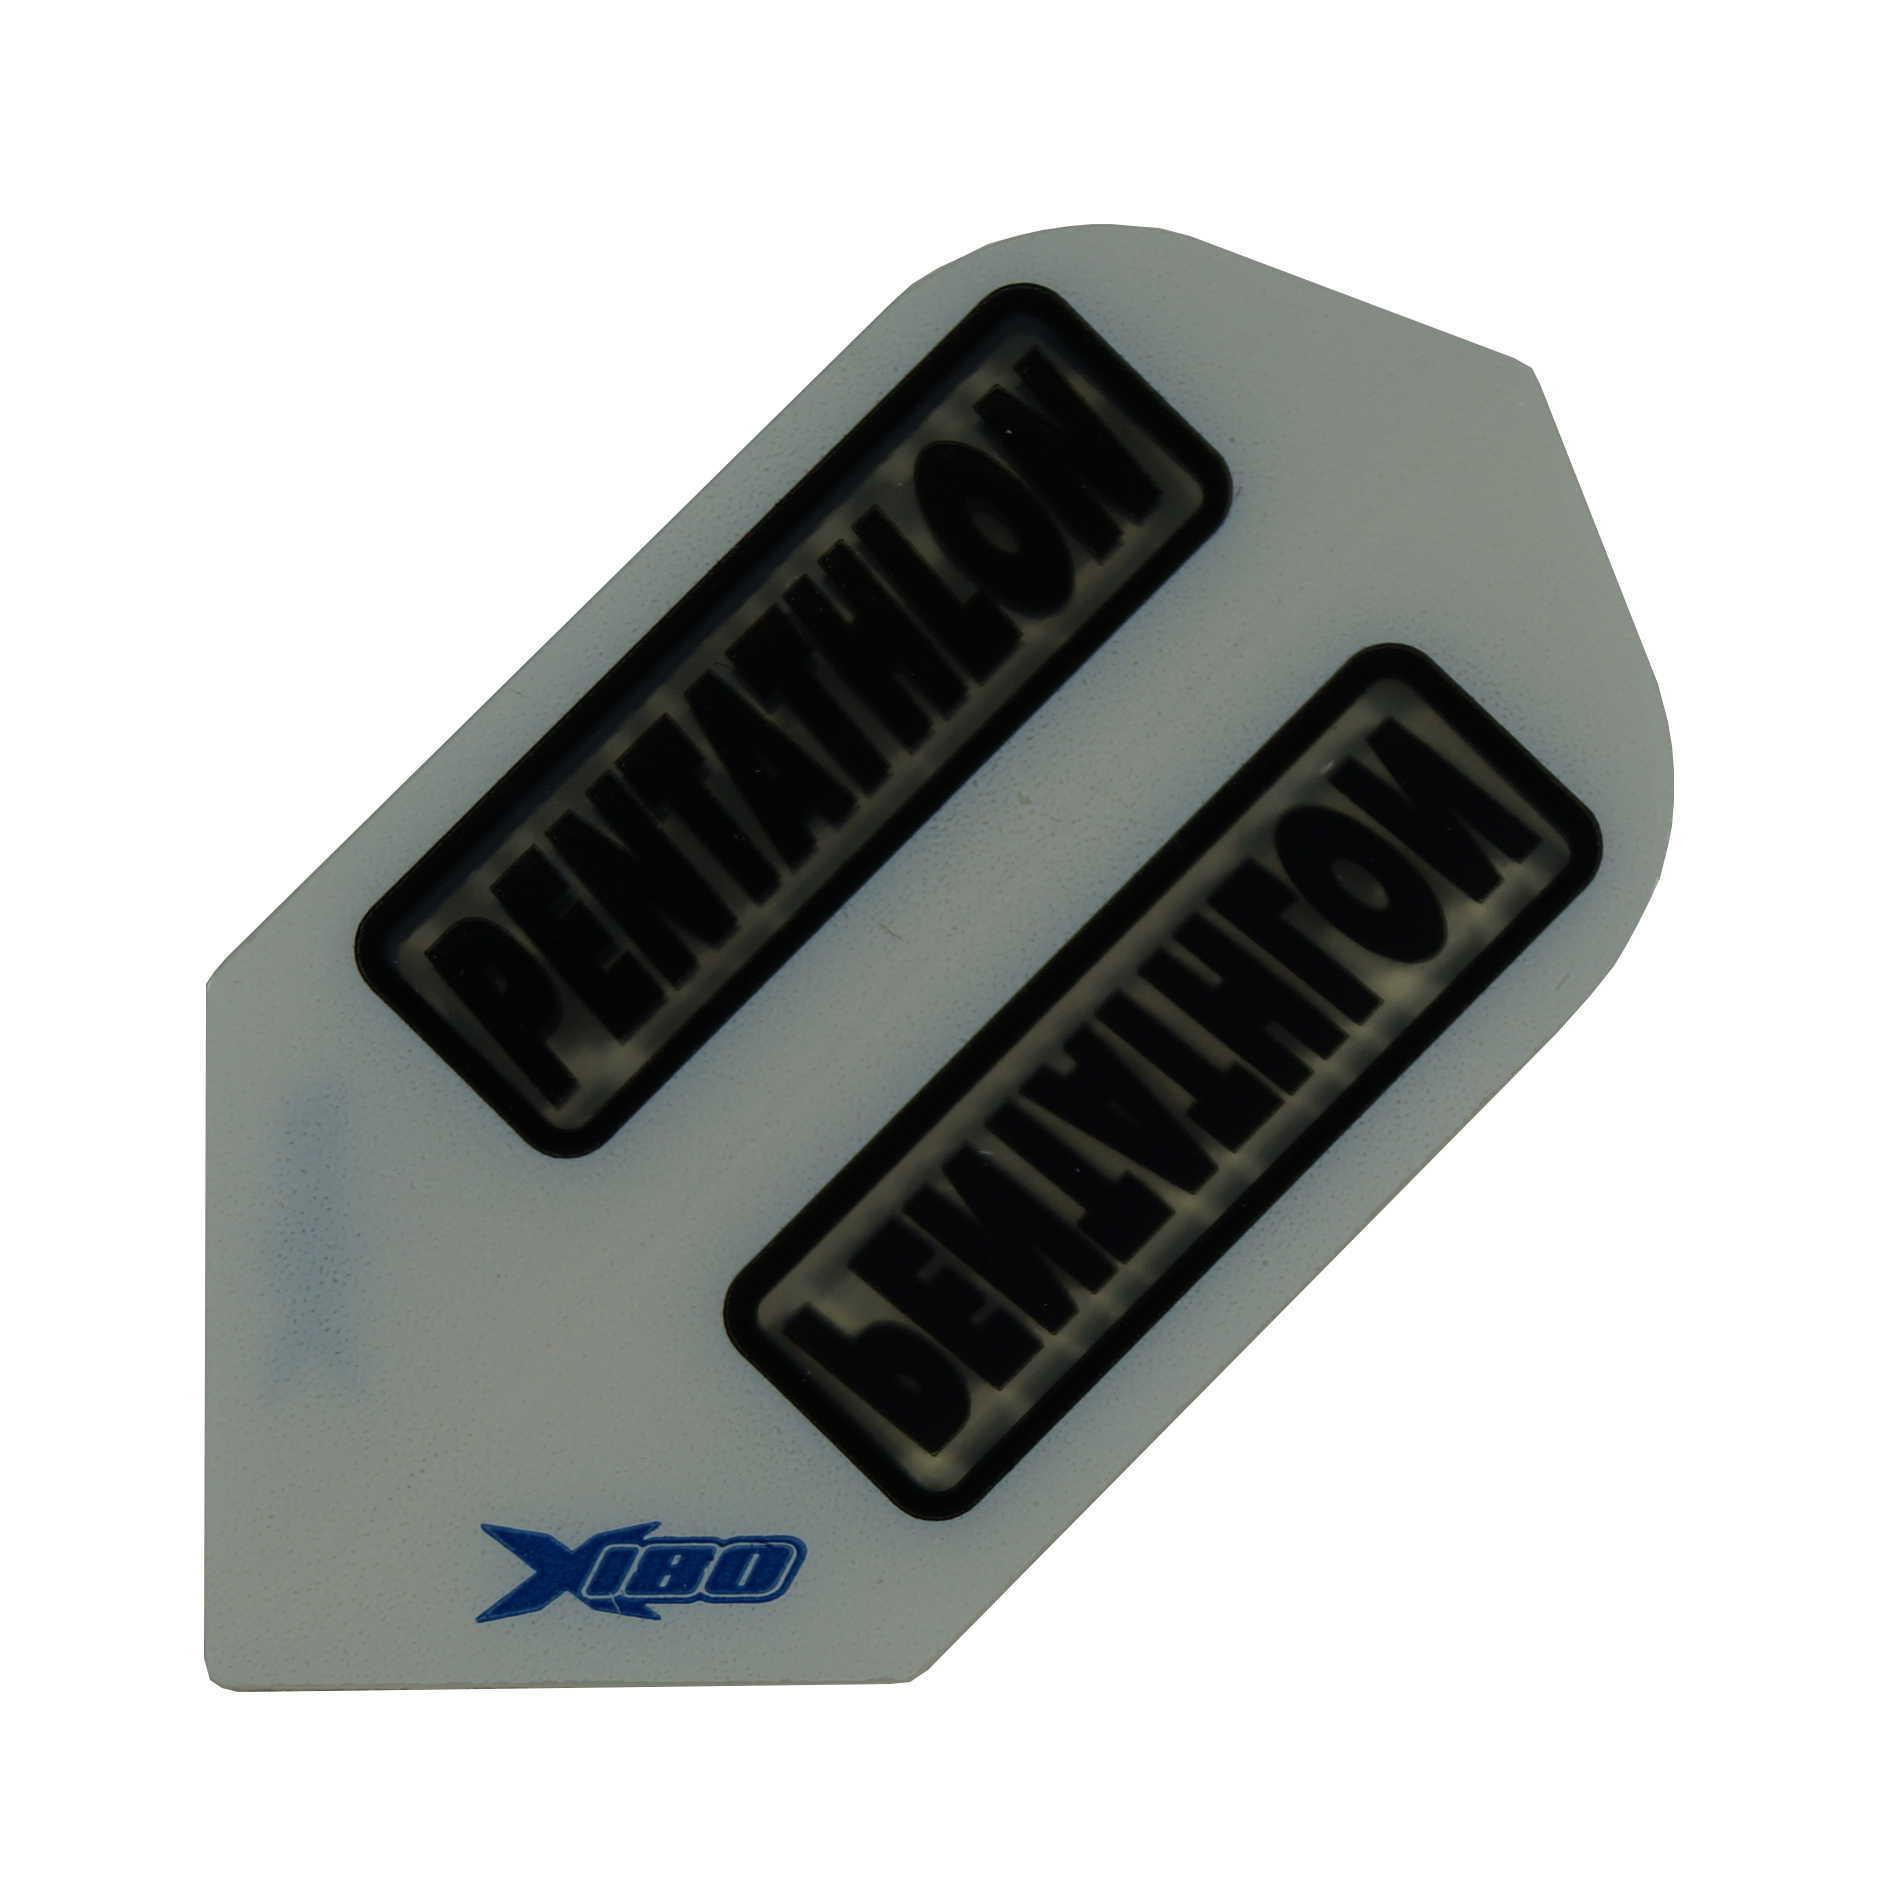 Pentathlon Flights X180 weiss-transp. Slim